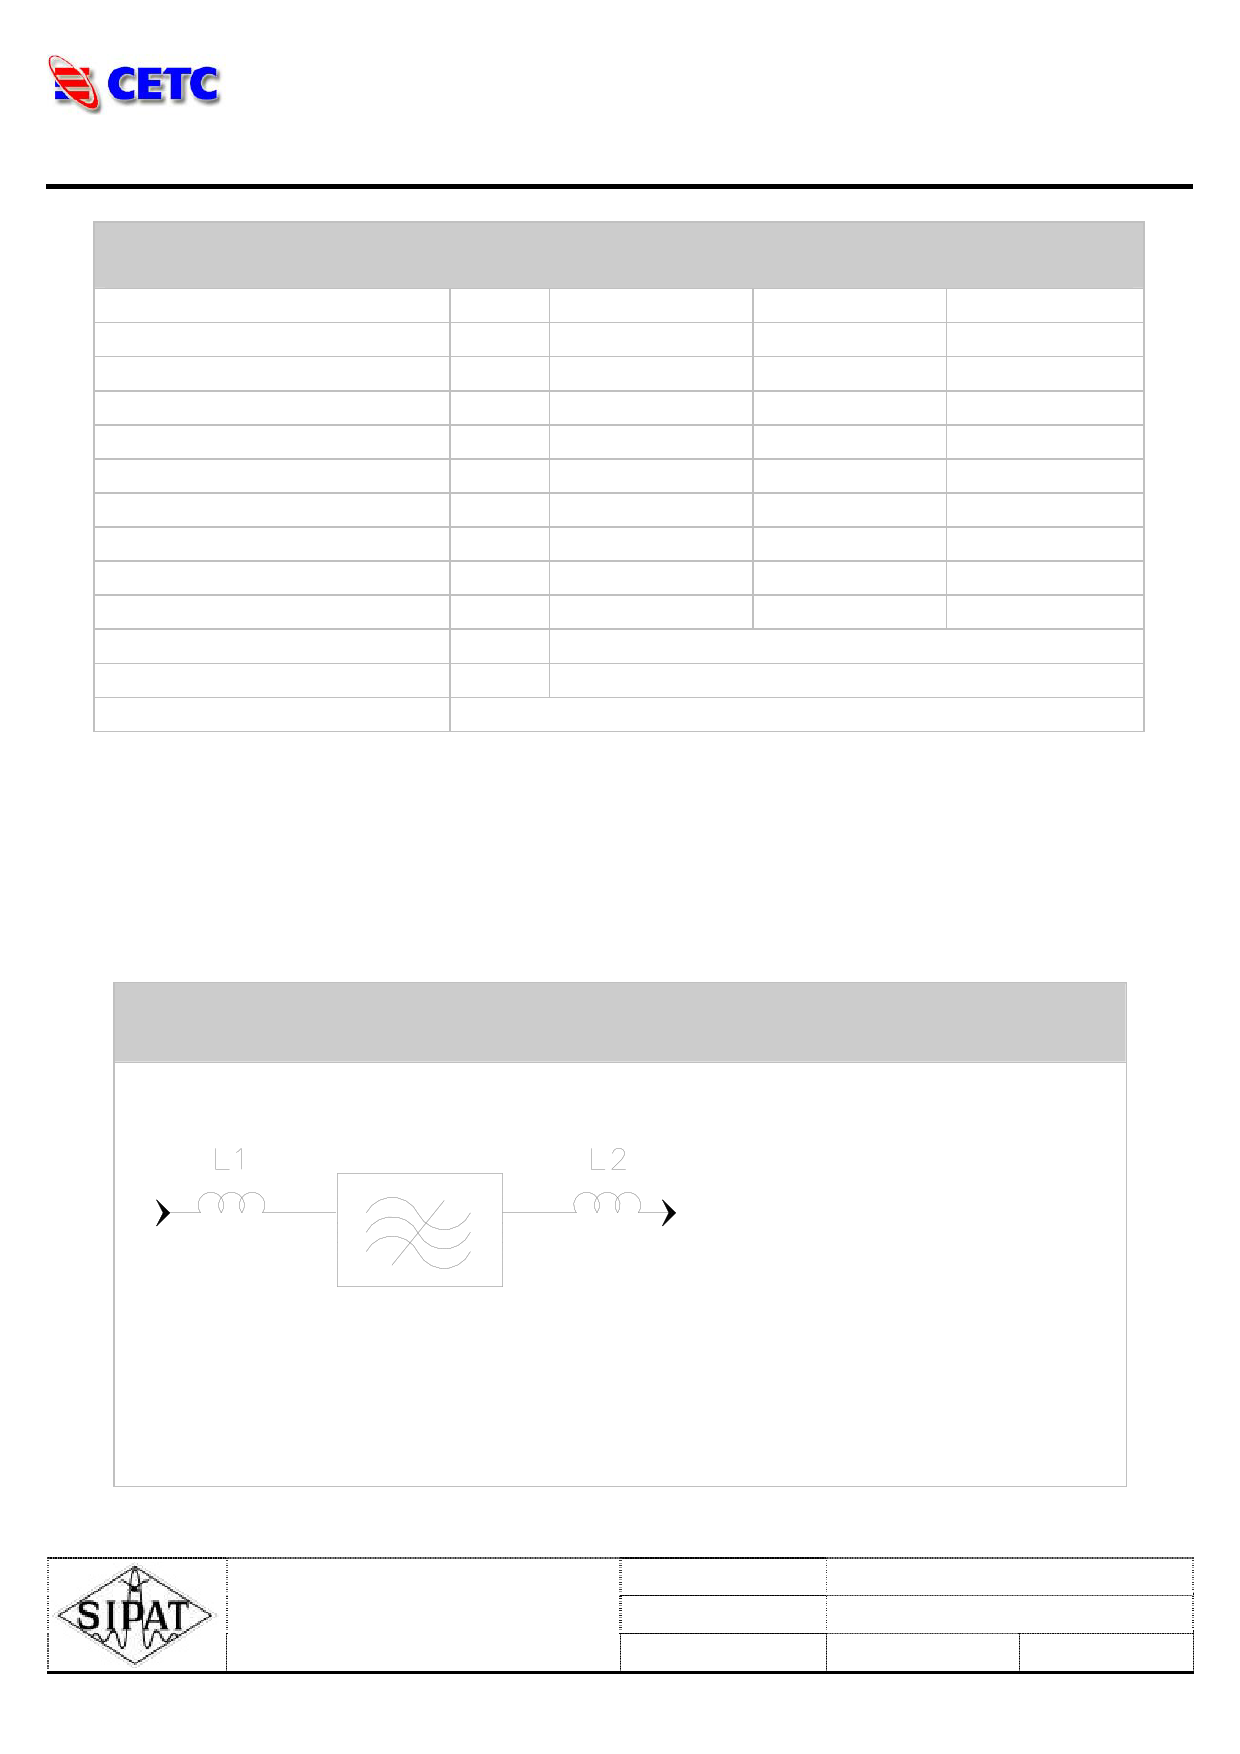 LBN7055 datasheet